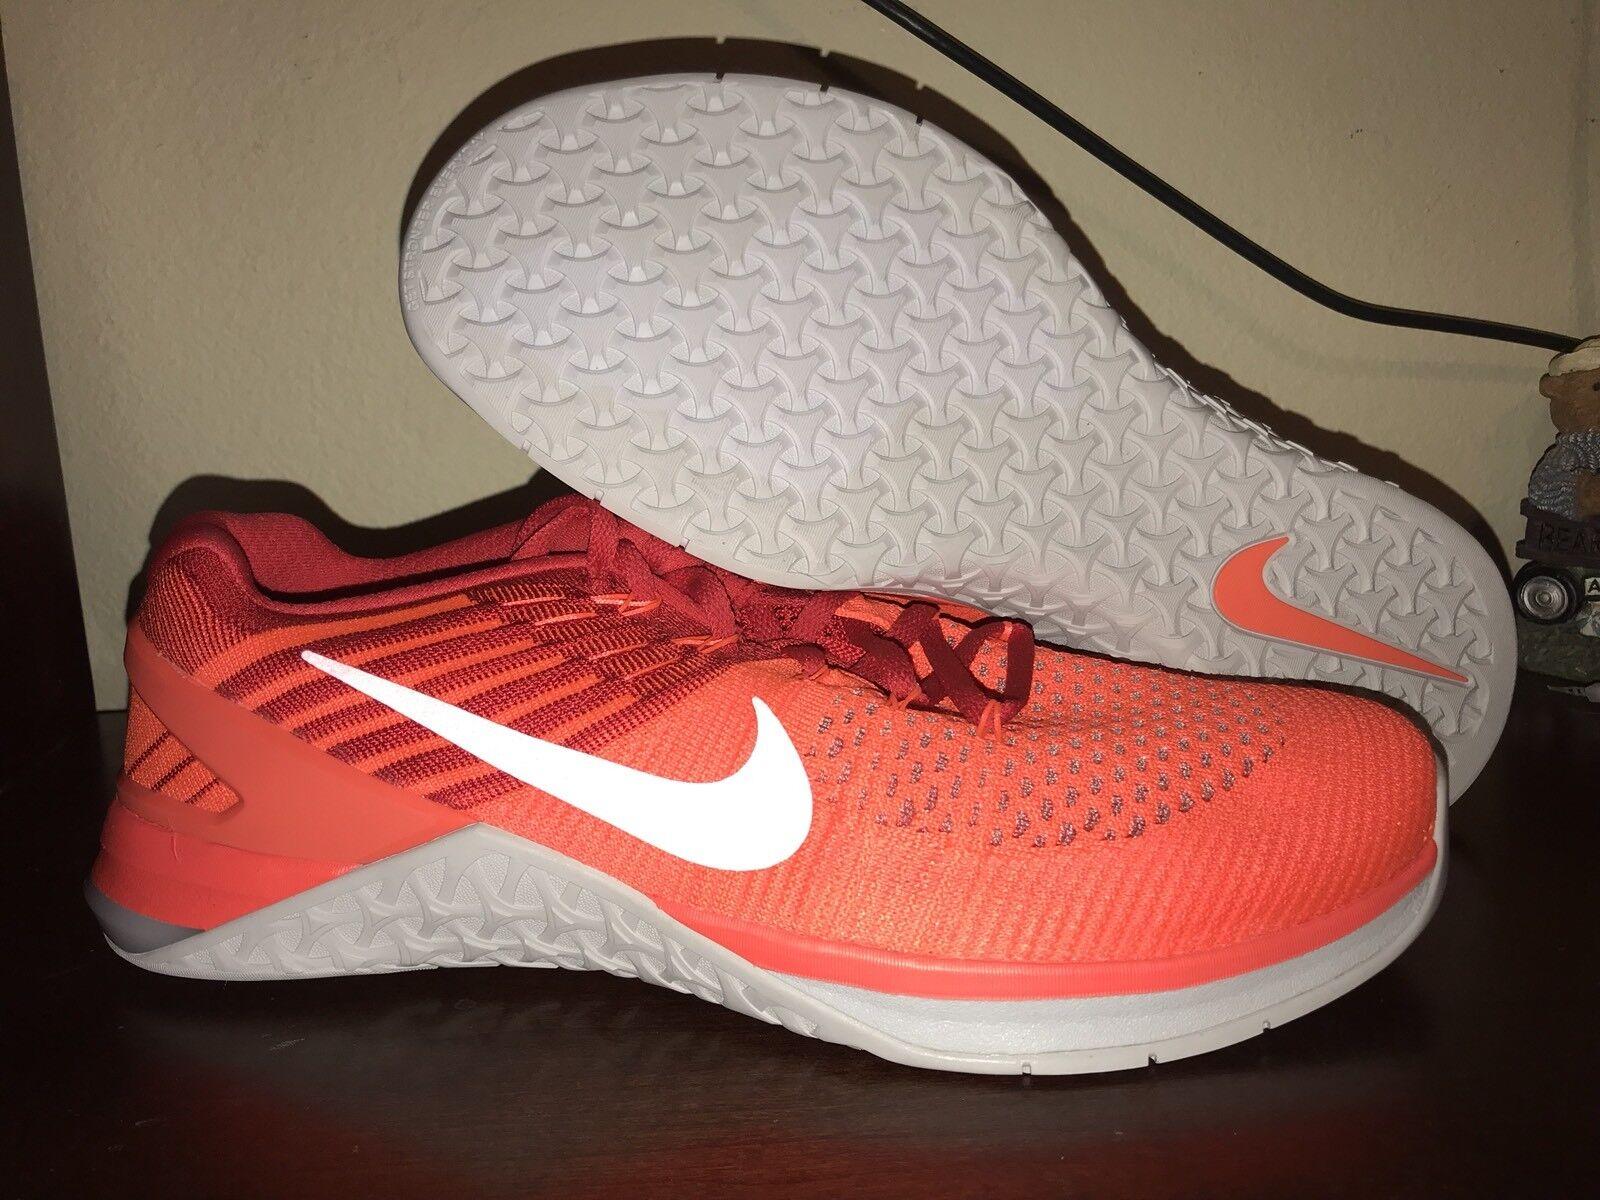 Nike Metcon DSX Flyknit Crimson orange University Red Mens Training shoes Sz 12.5